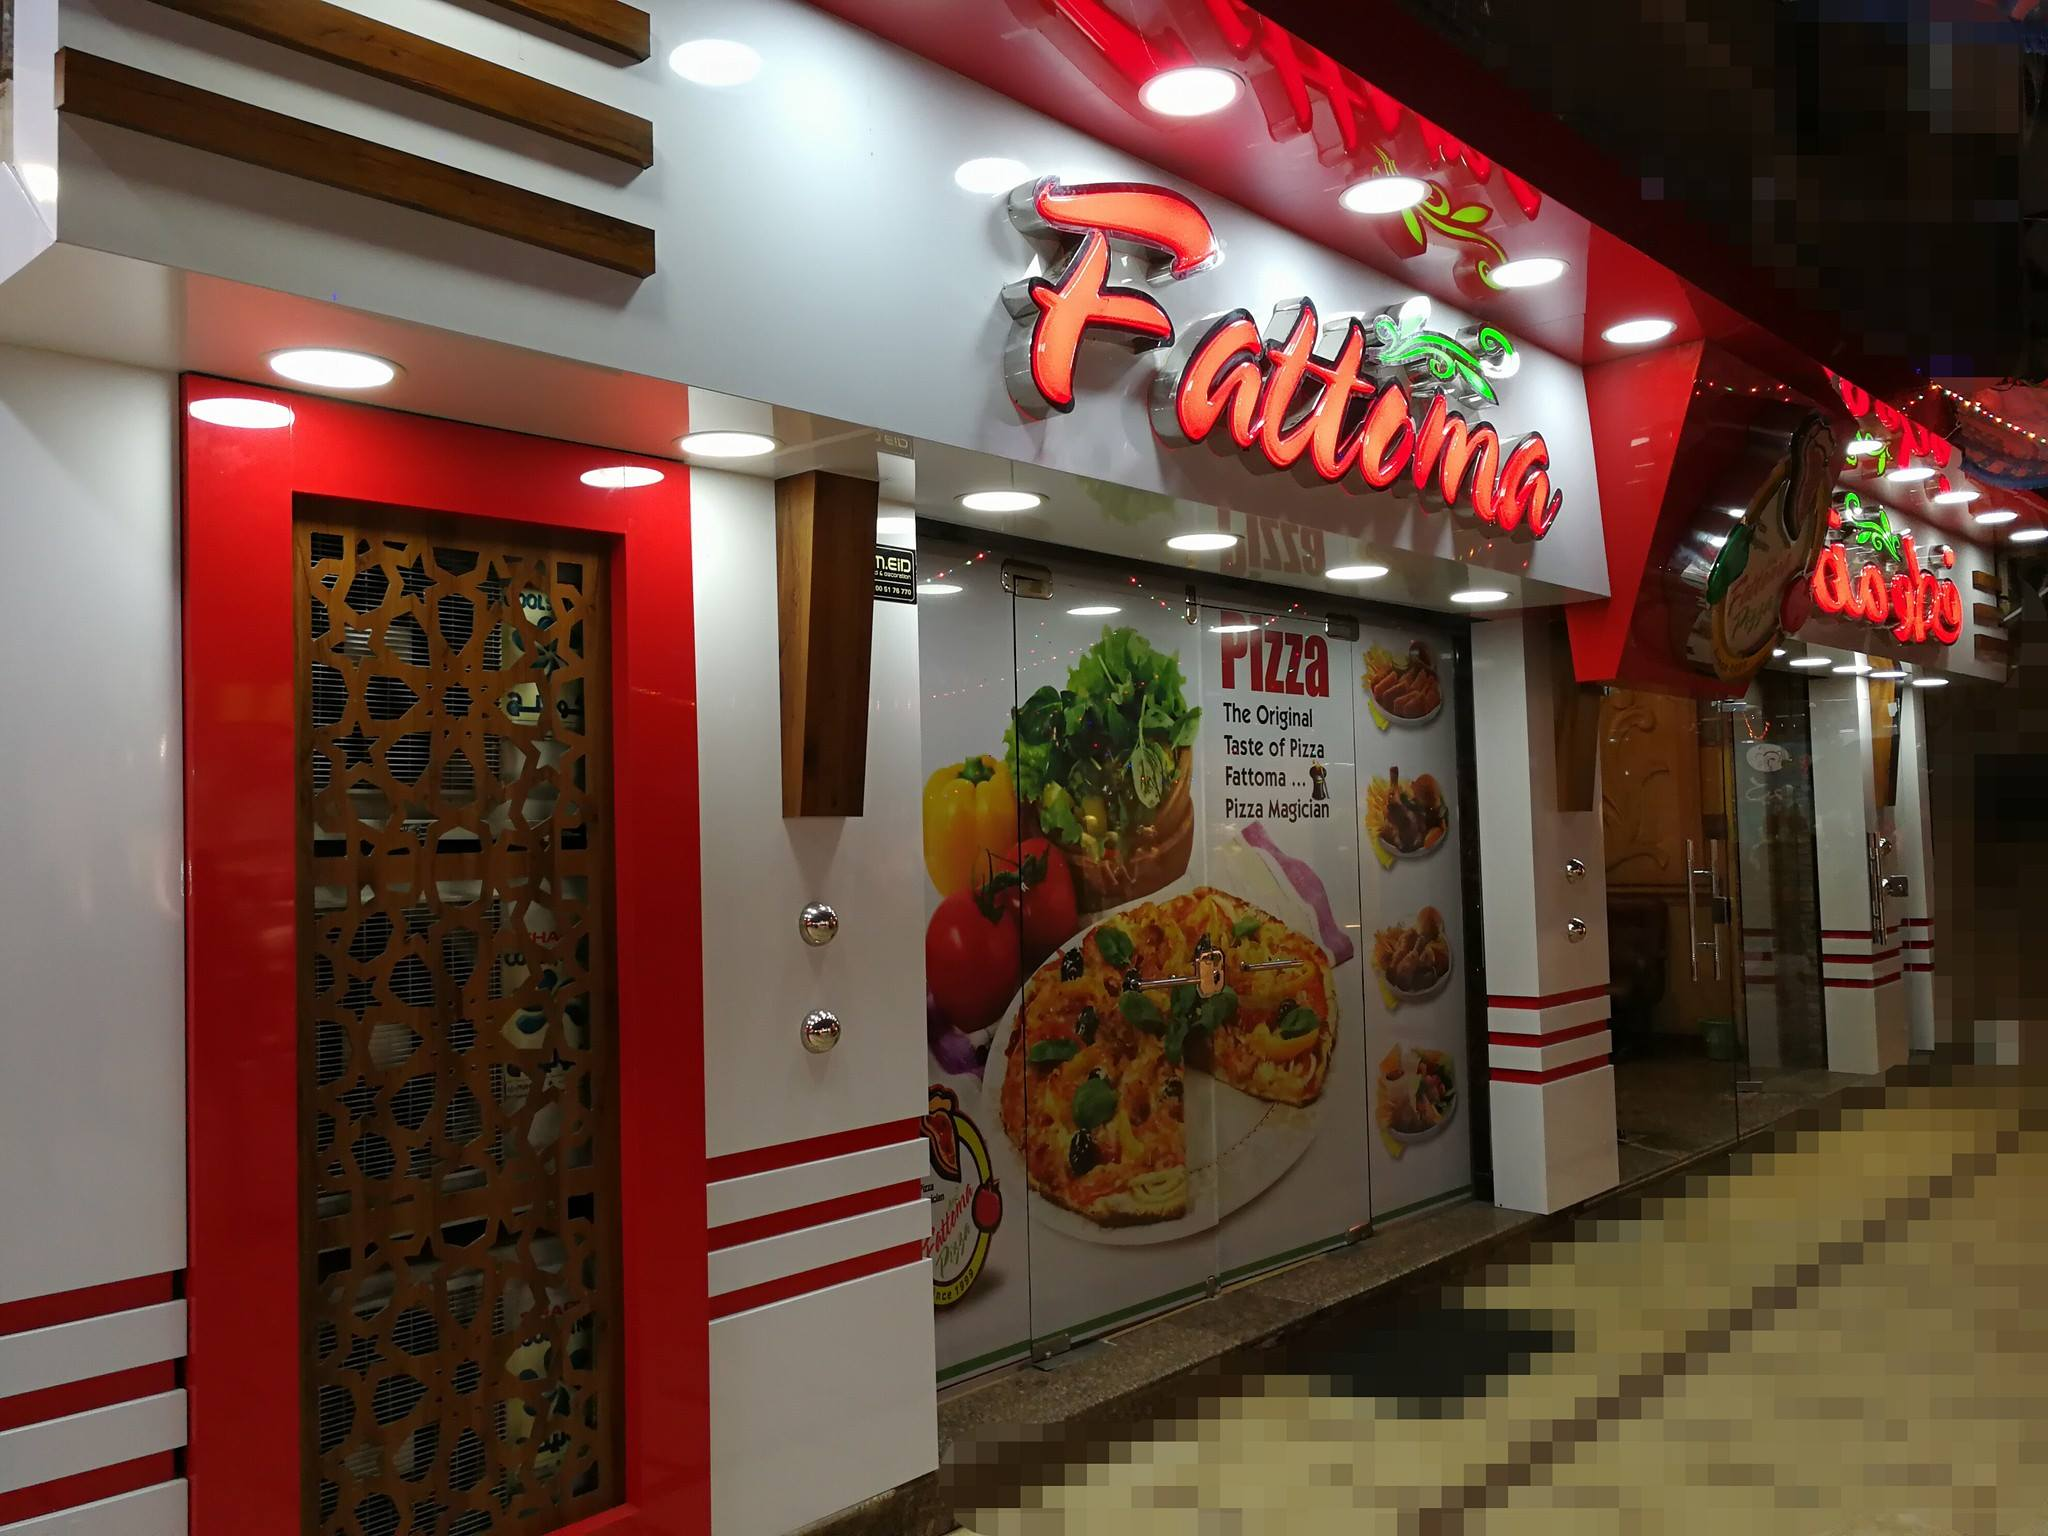 أسعار منيو وفروع ورقم مطعم فطومة fattoma